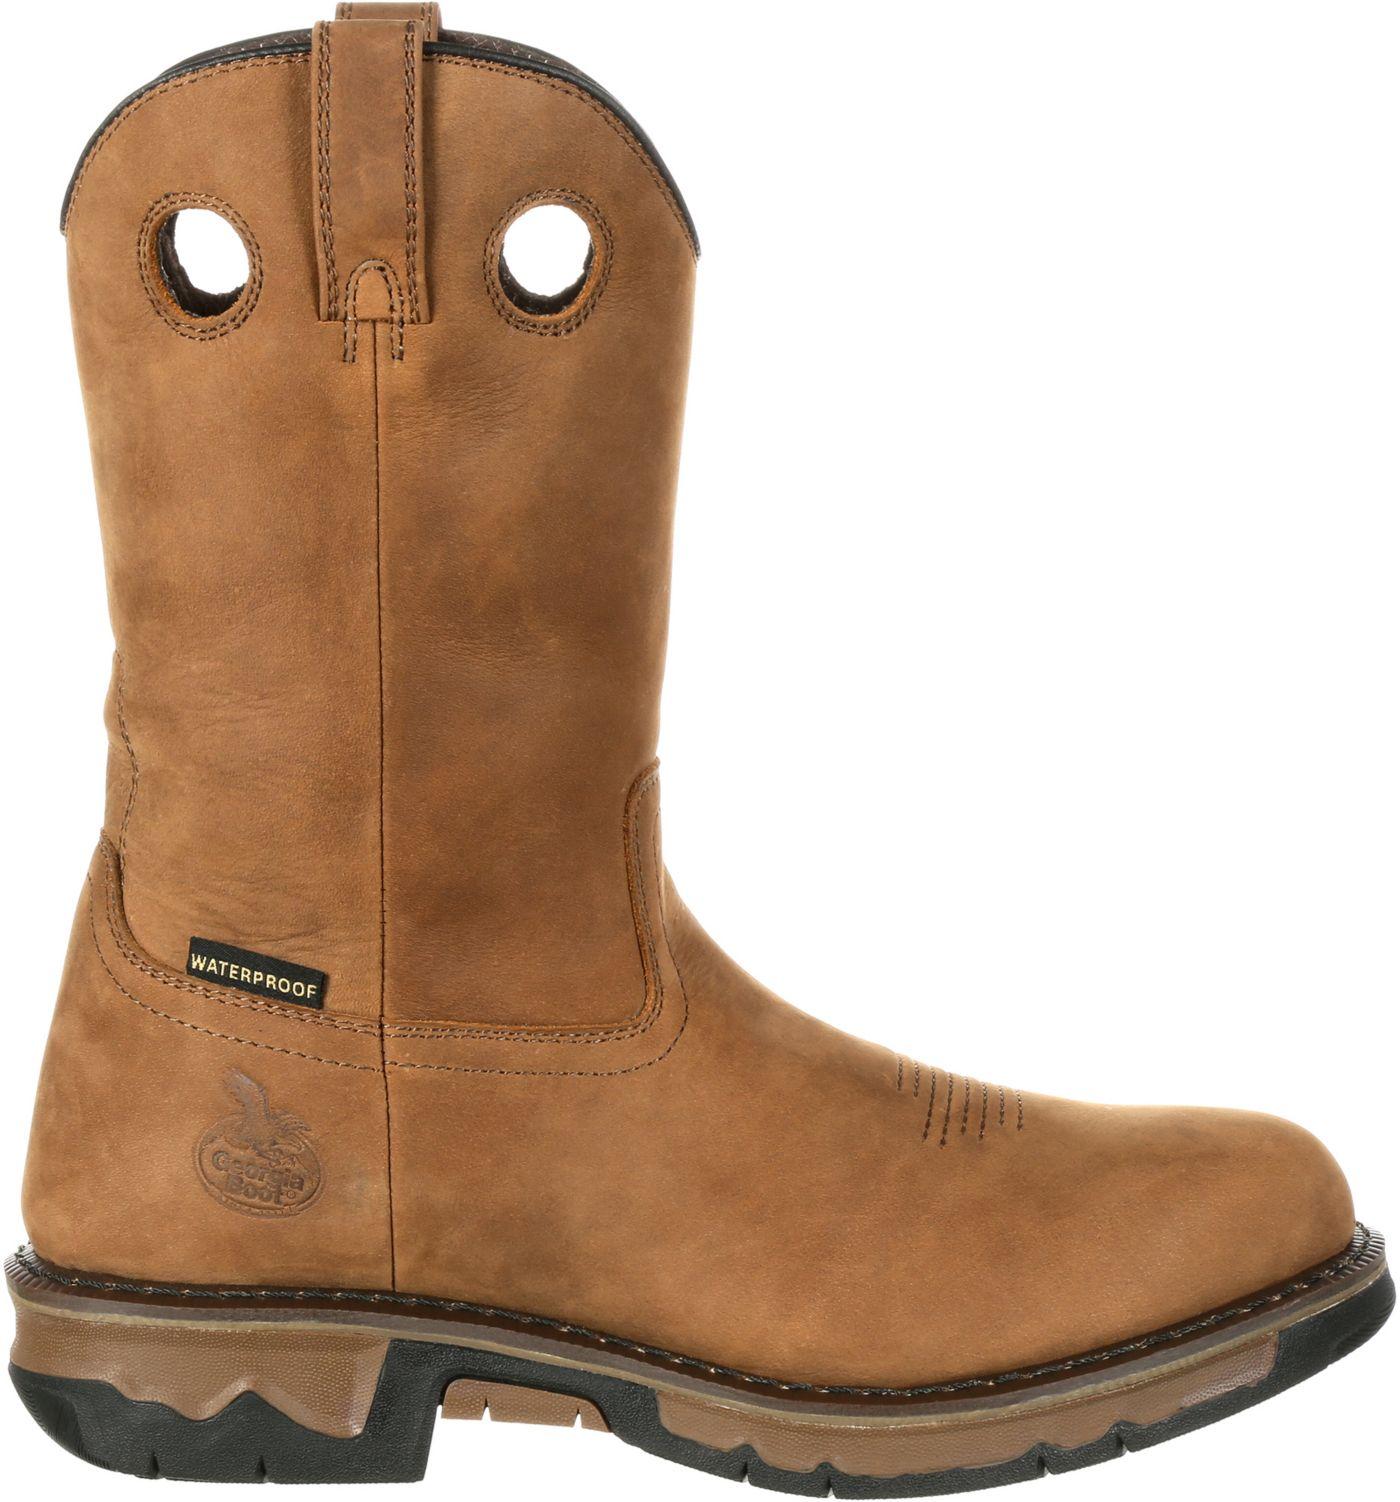 Georgia Boot Men's Carbo-Tec Waterproof EH Composite Toe Work Boots